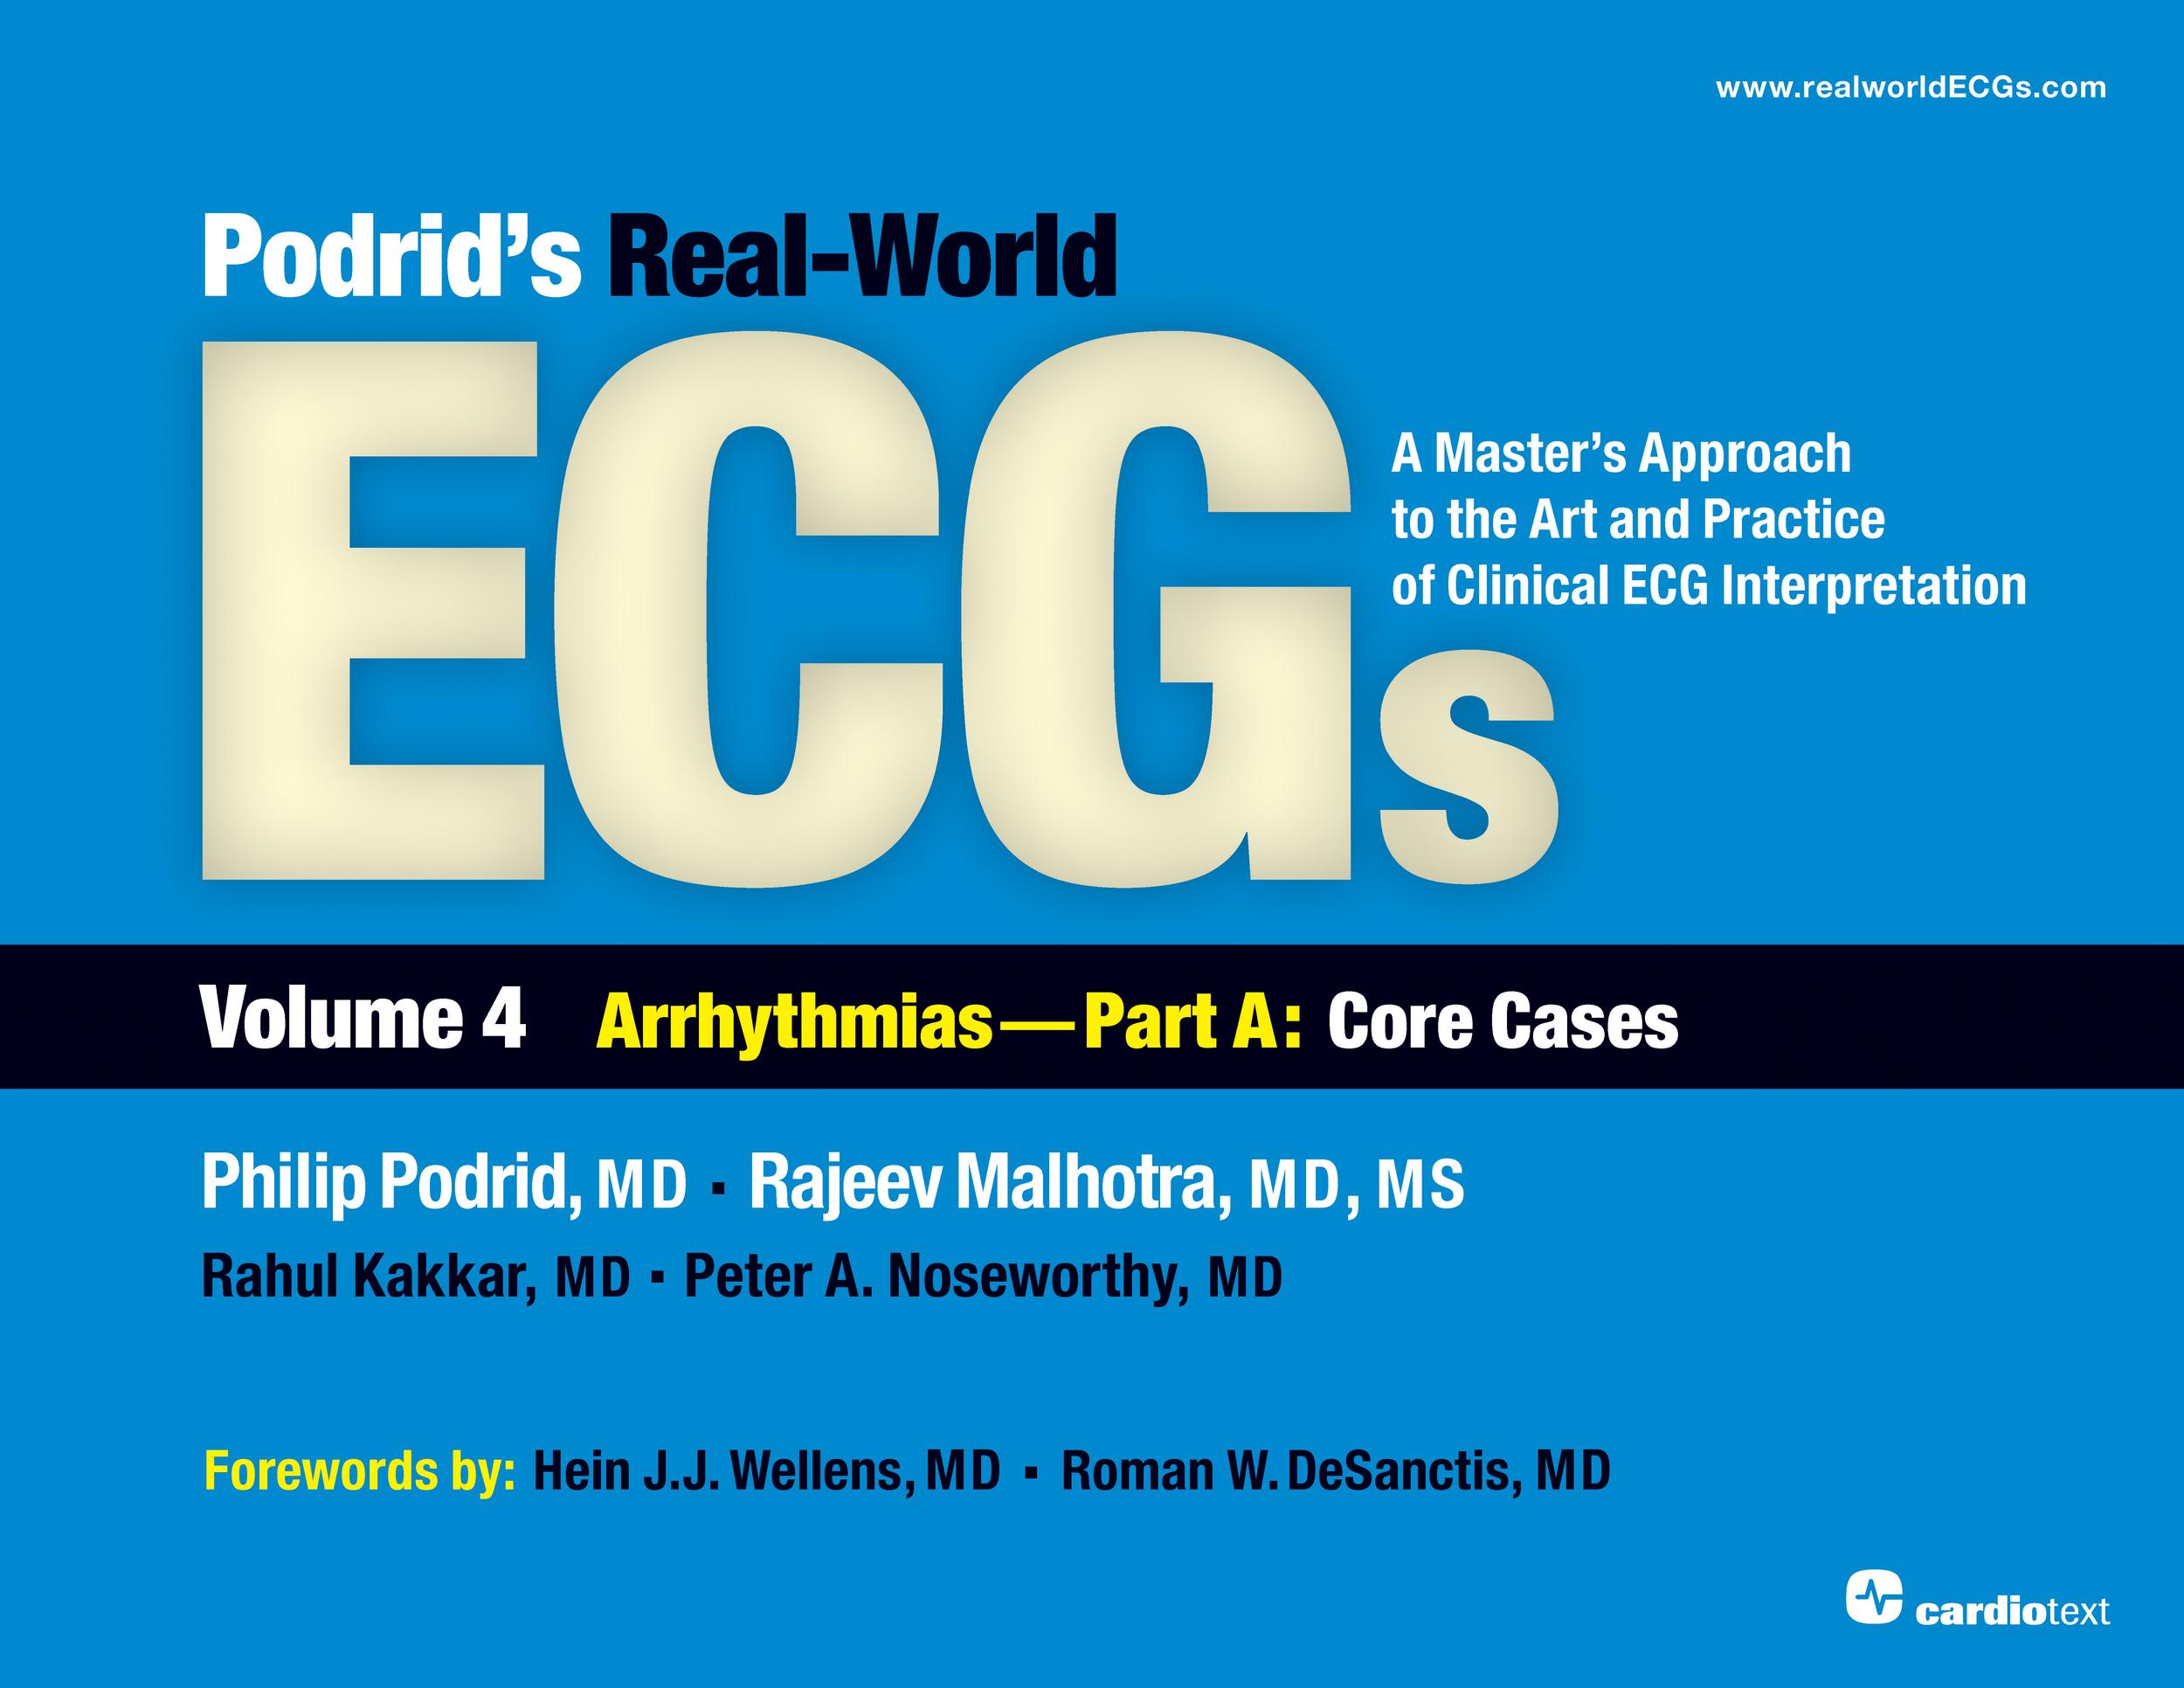 Podrid's Real-World ECGs Volume 4A